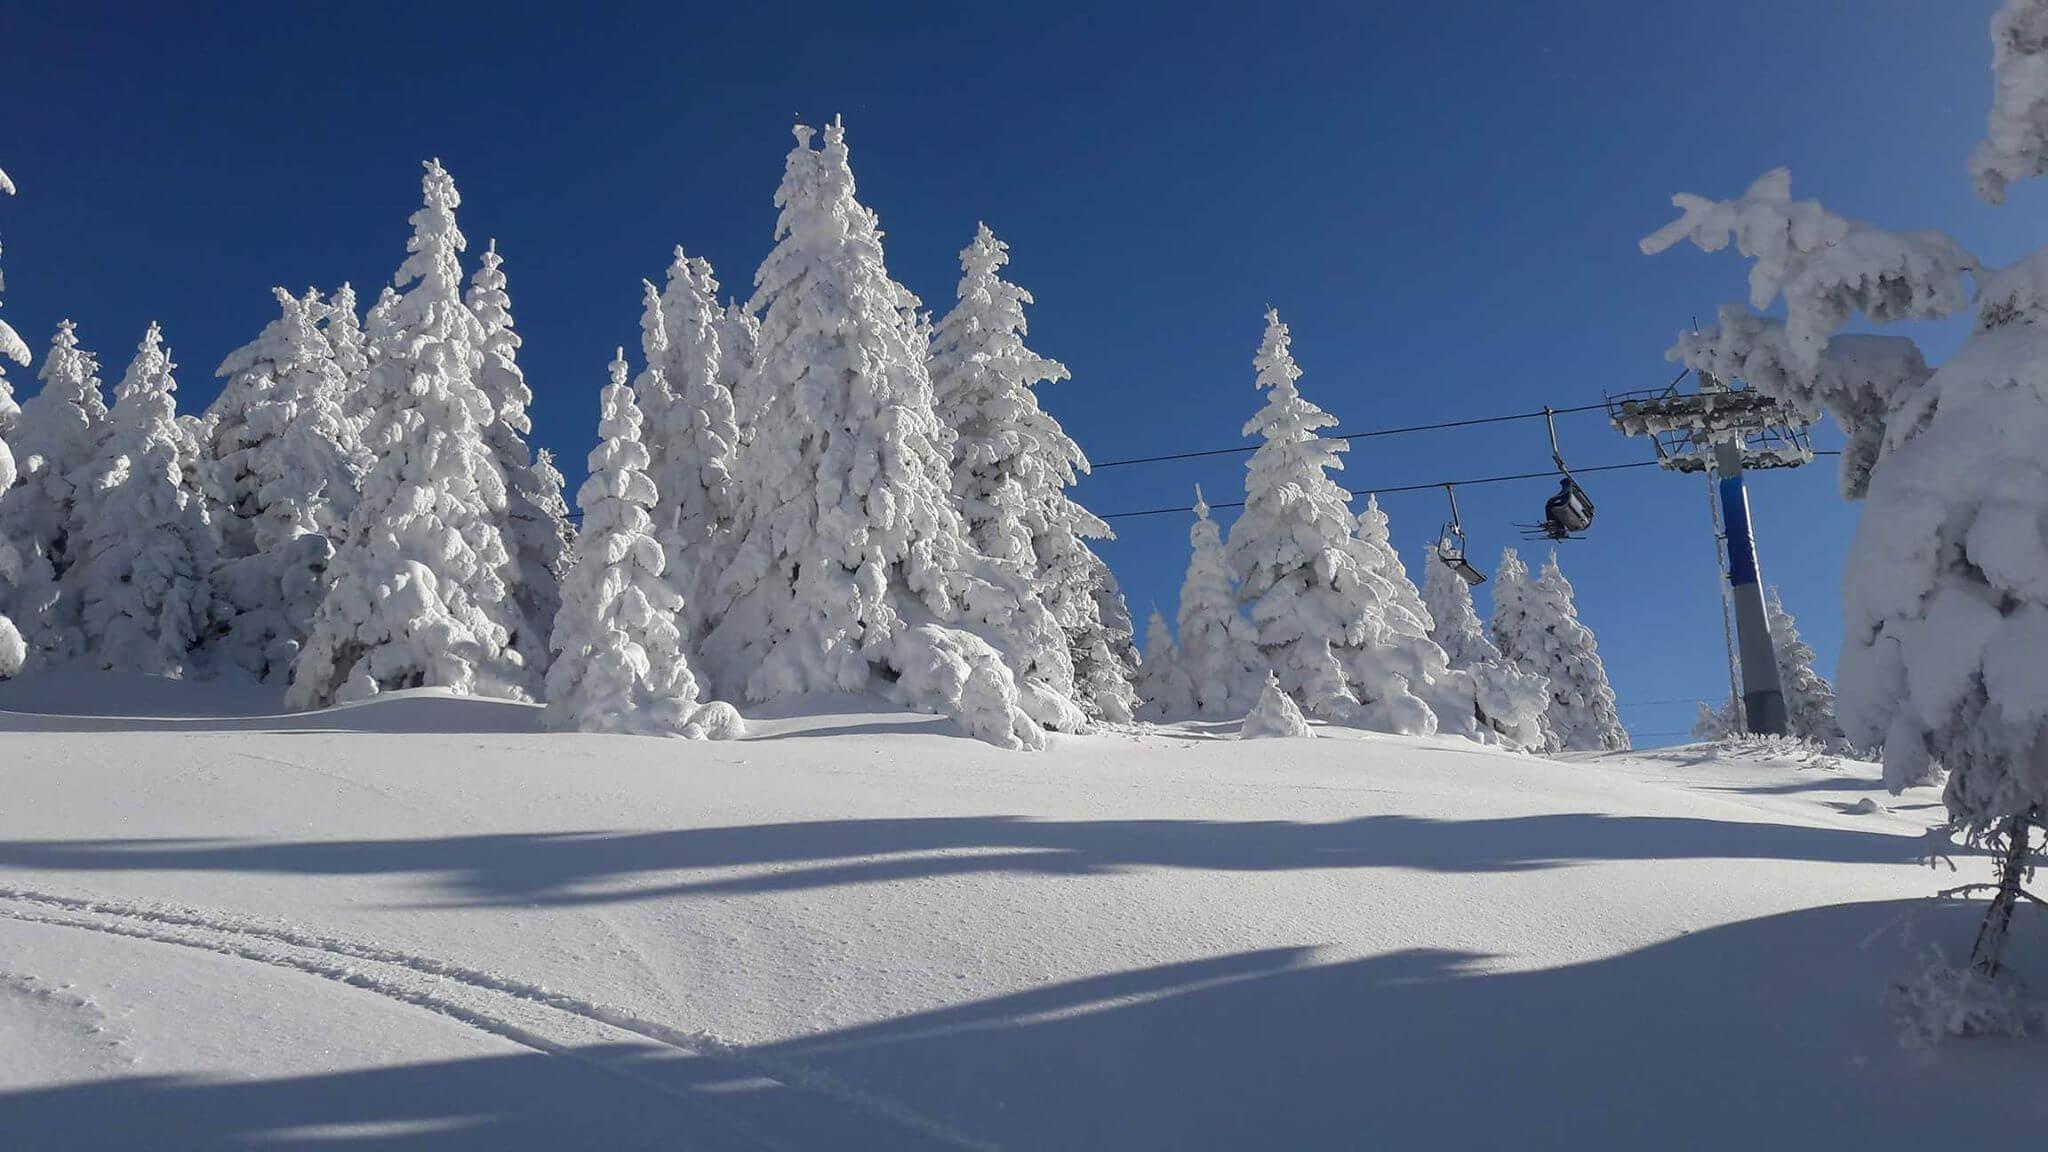 Snežna idila na Kopaoniku (3) - 21. decembar 2017